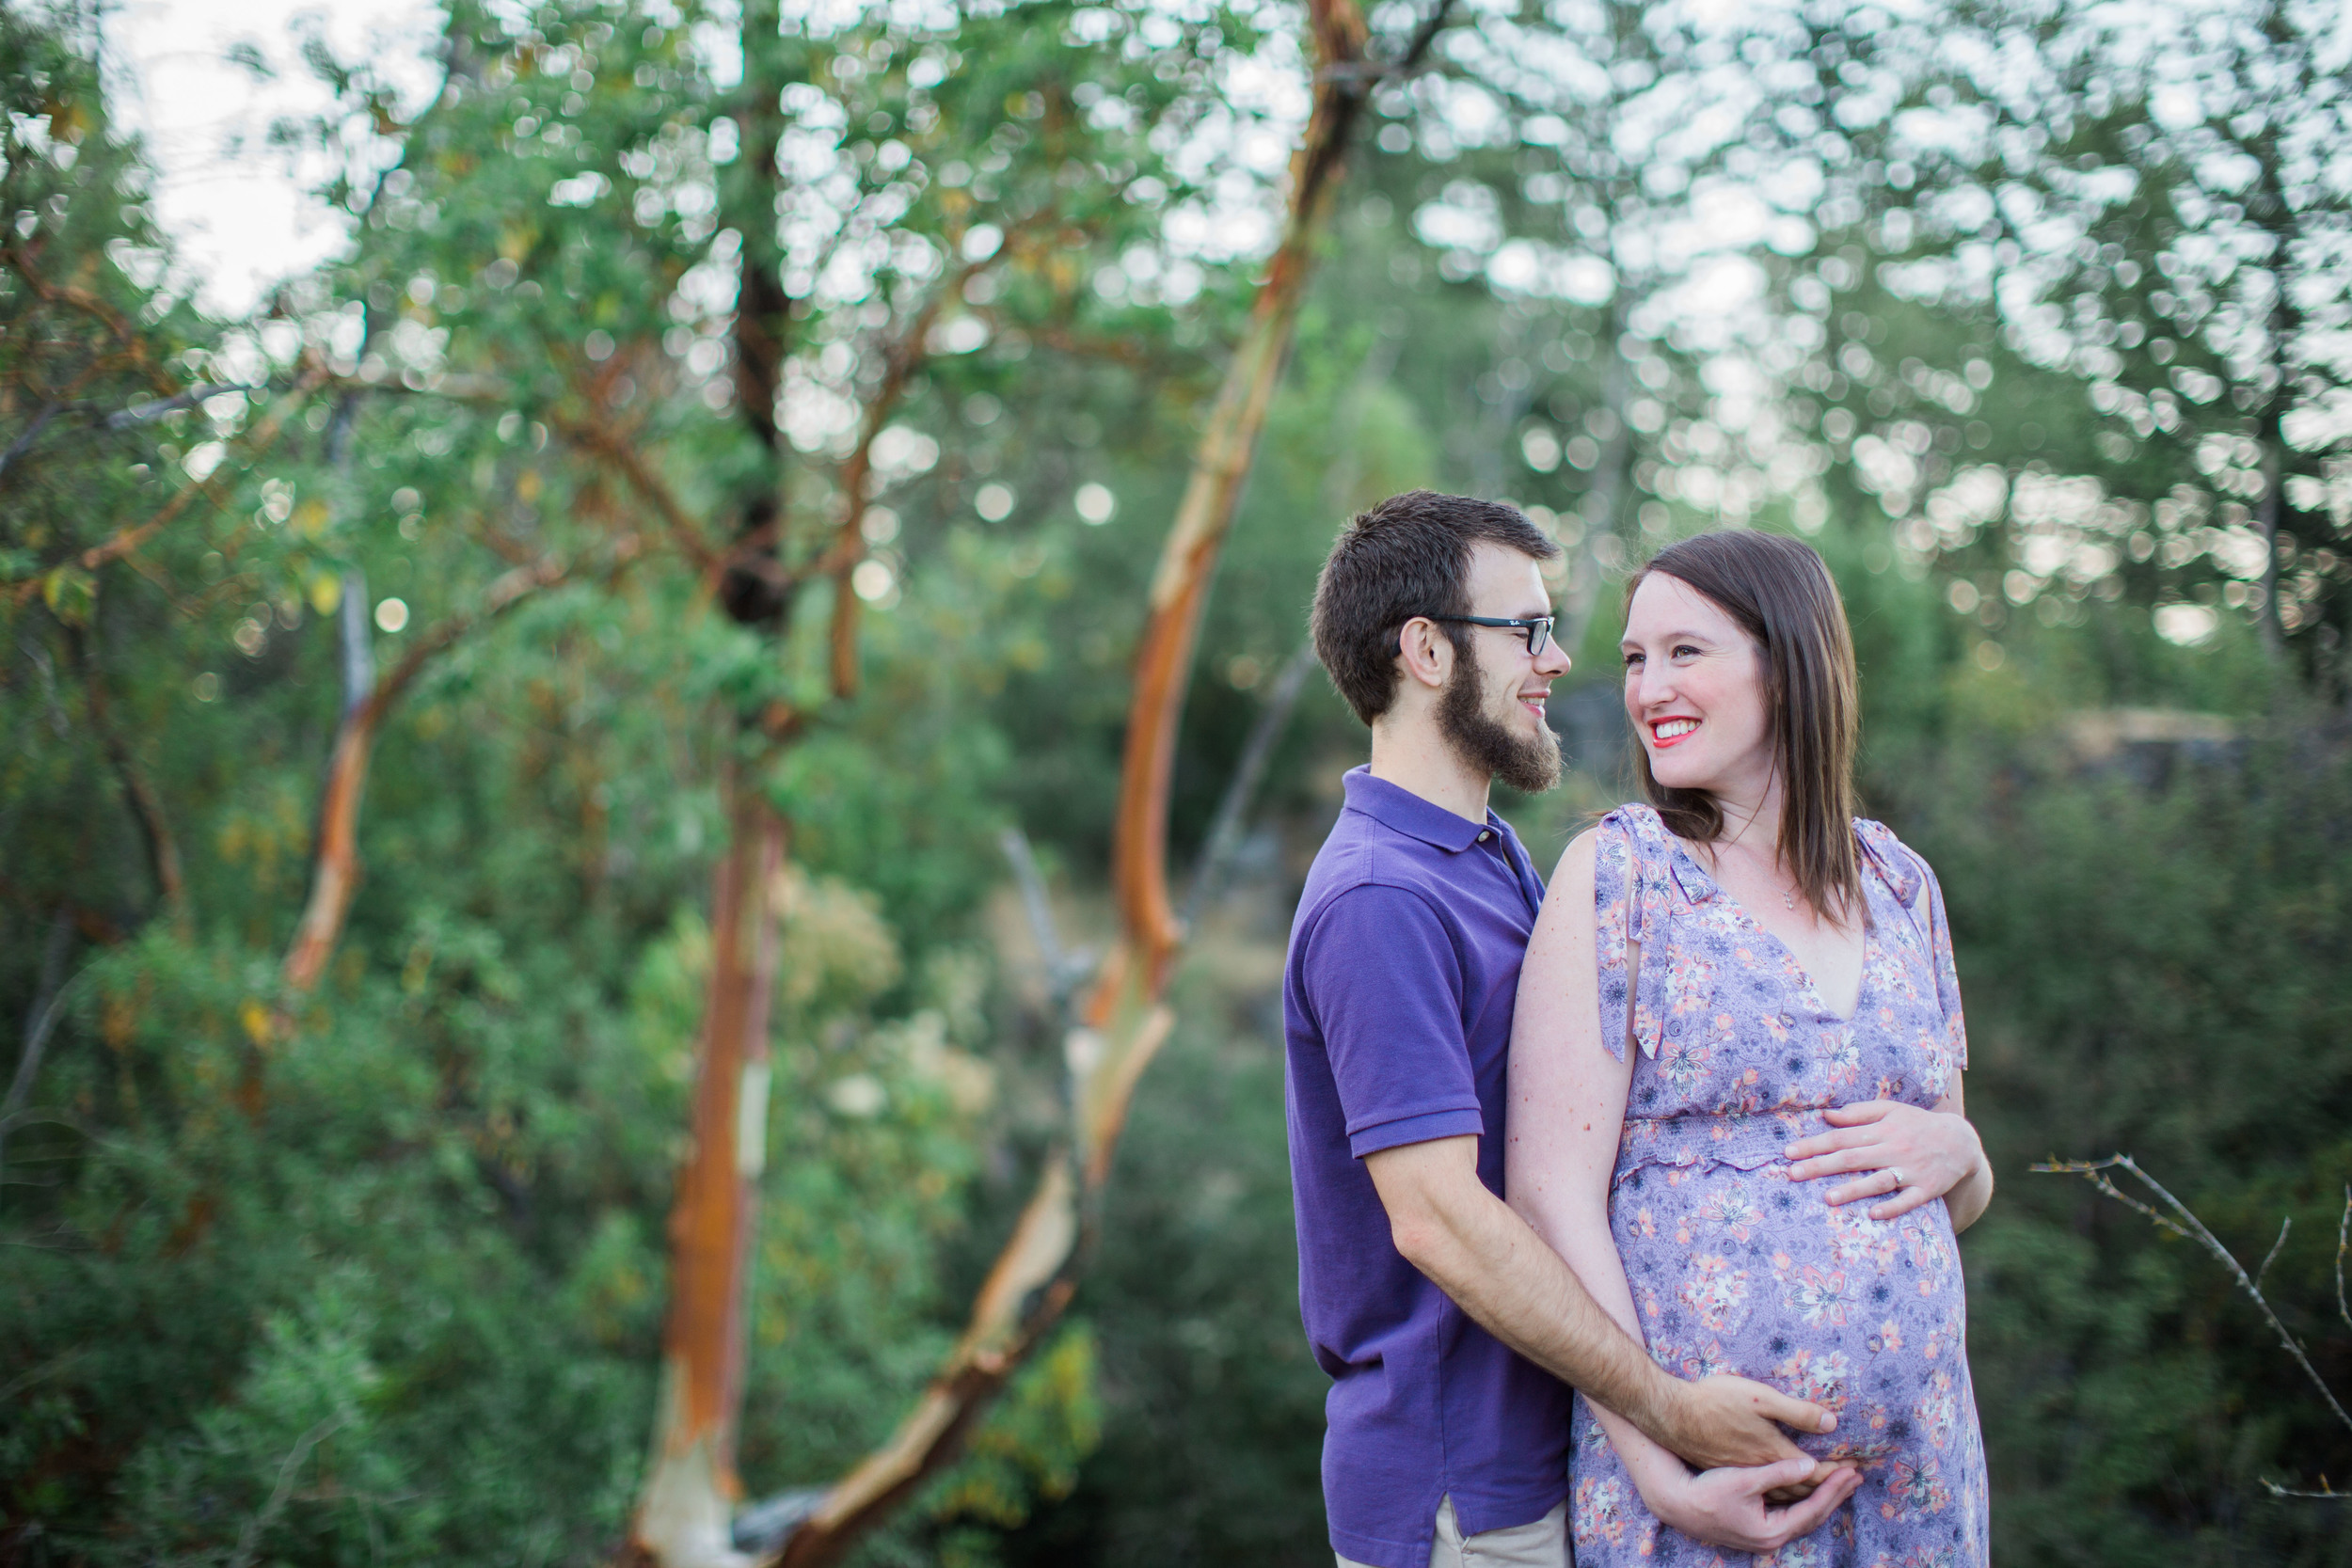 BrookeShane_maternity-5.jpg